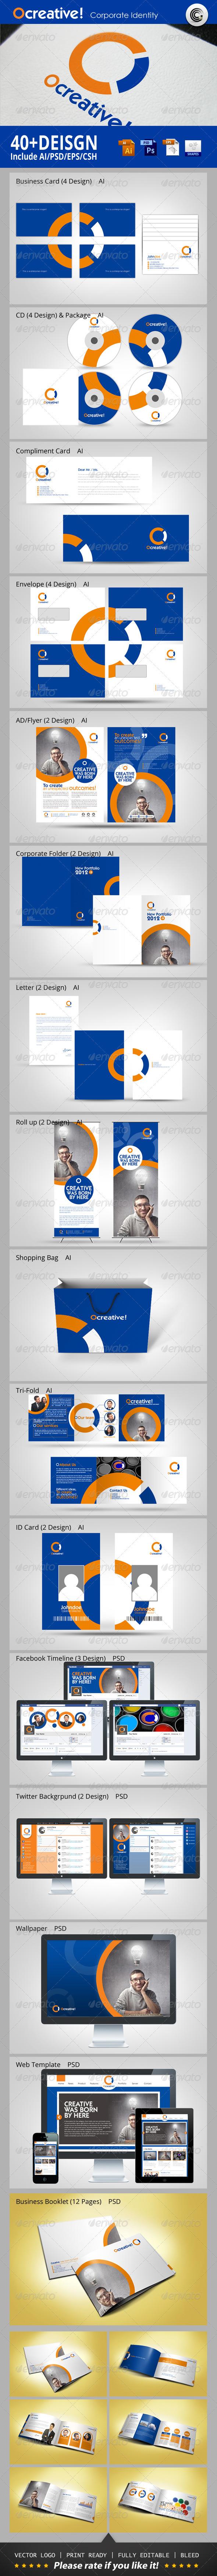 OCreative Studio Corporate Identity - Stationery Print Templates